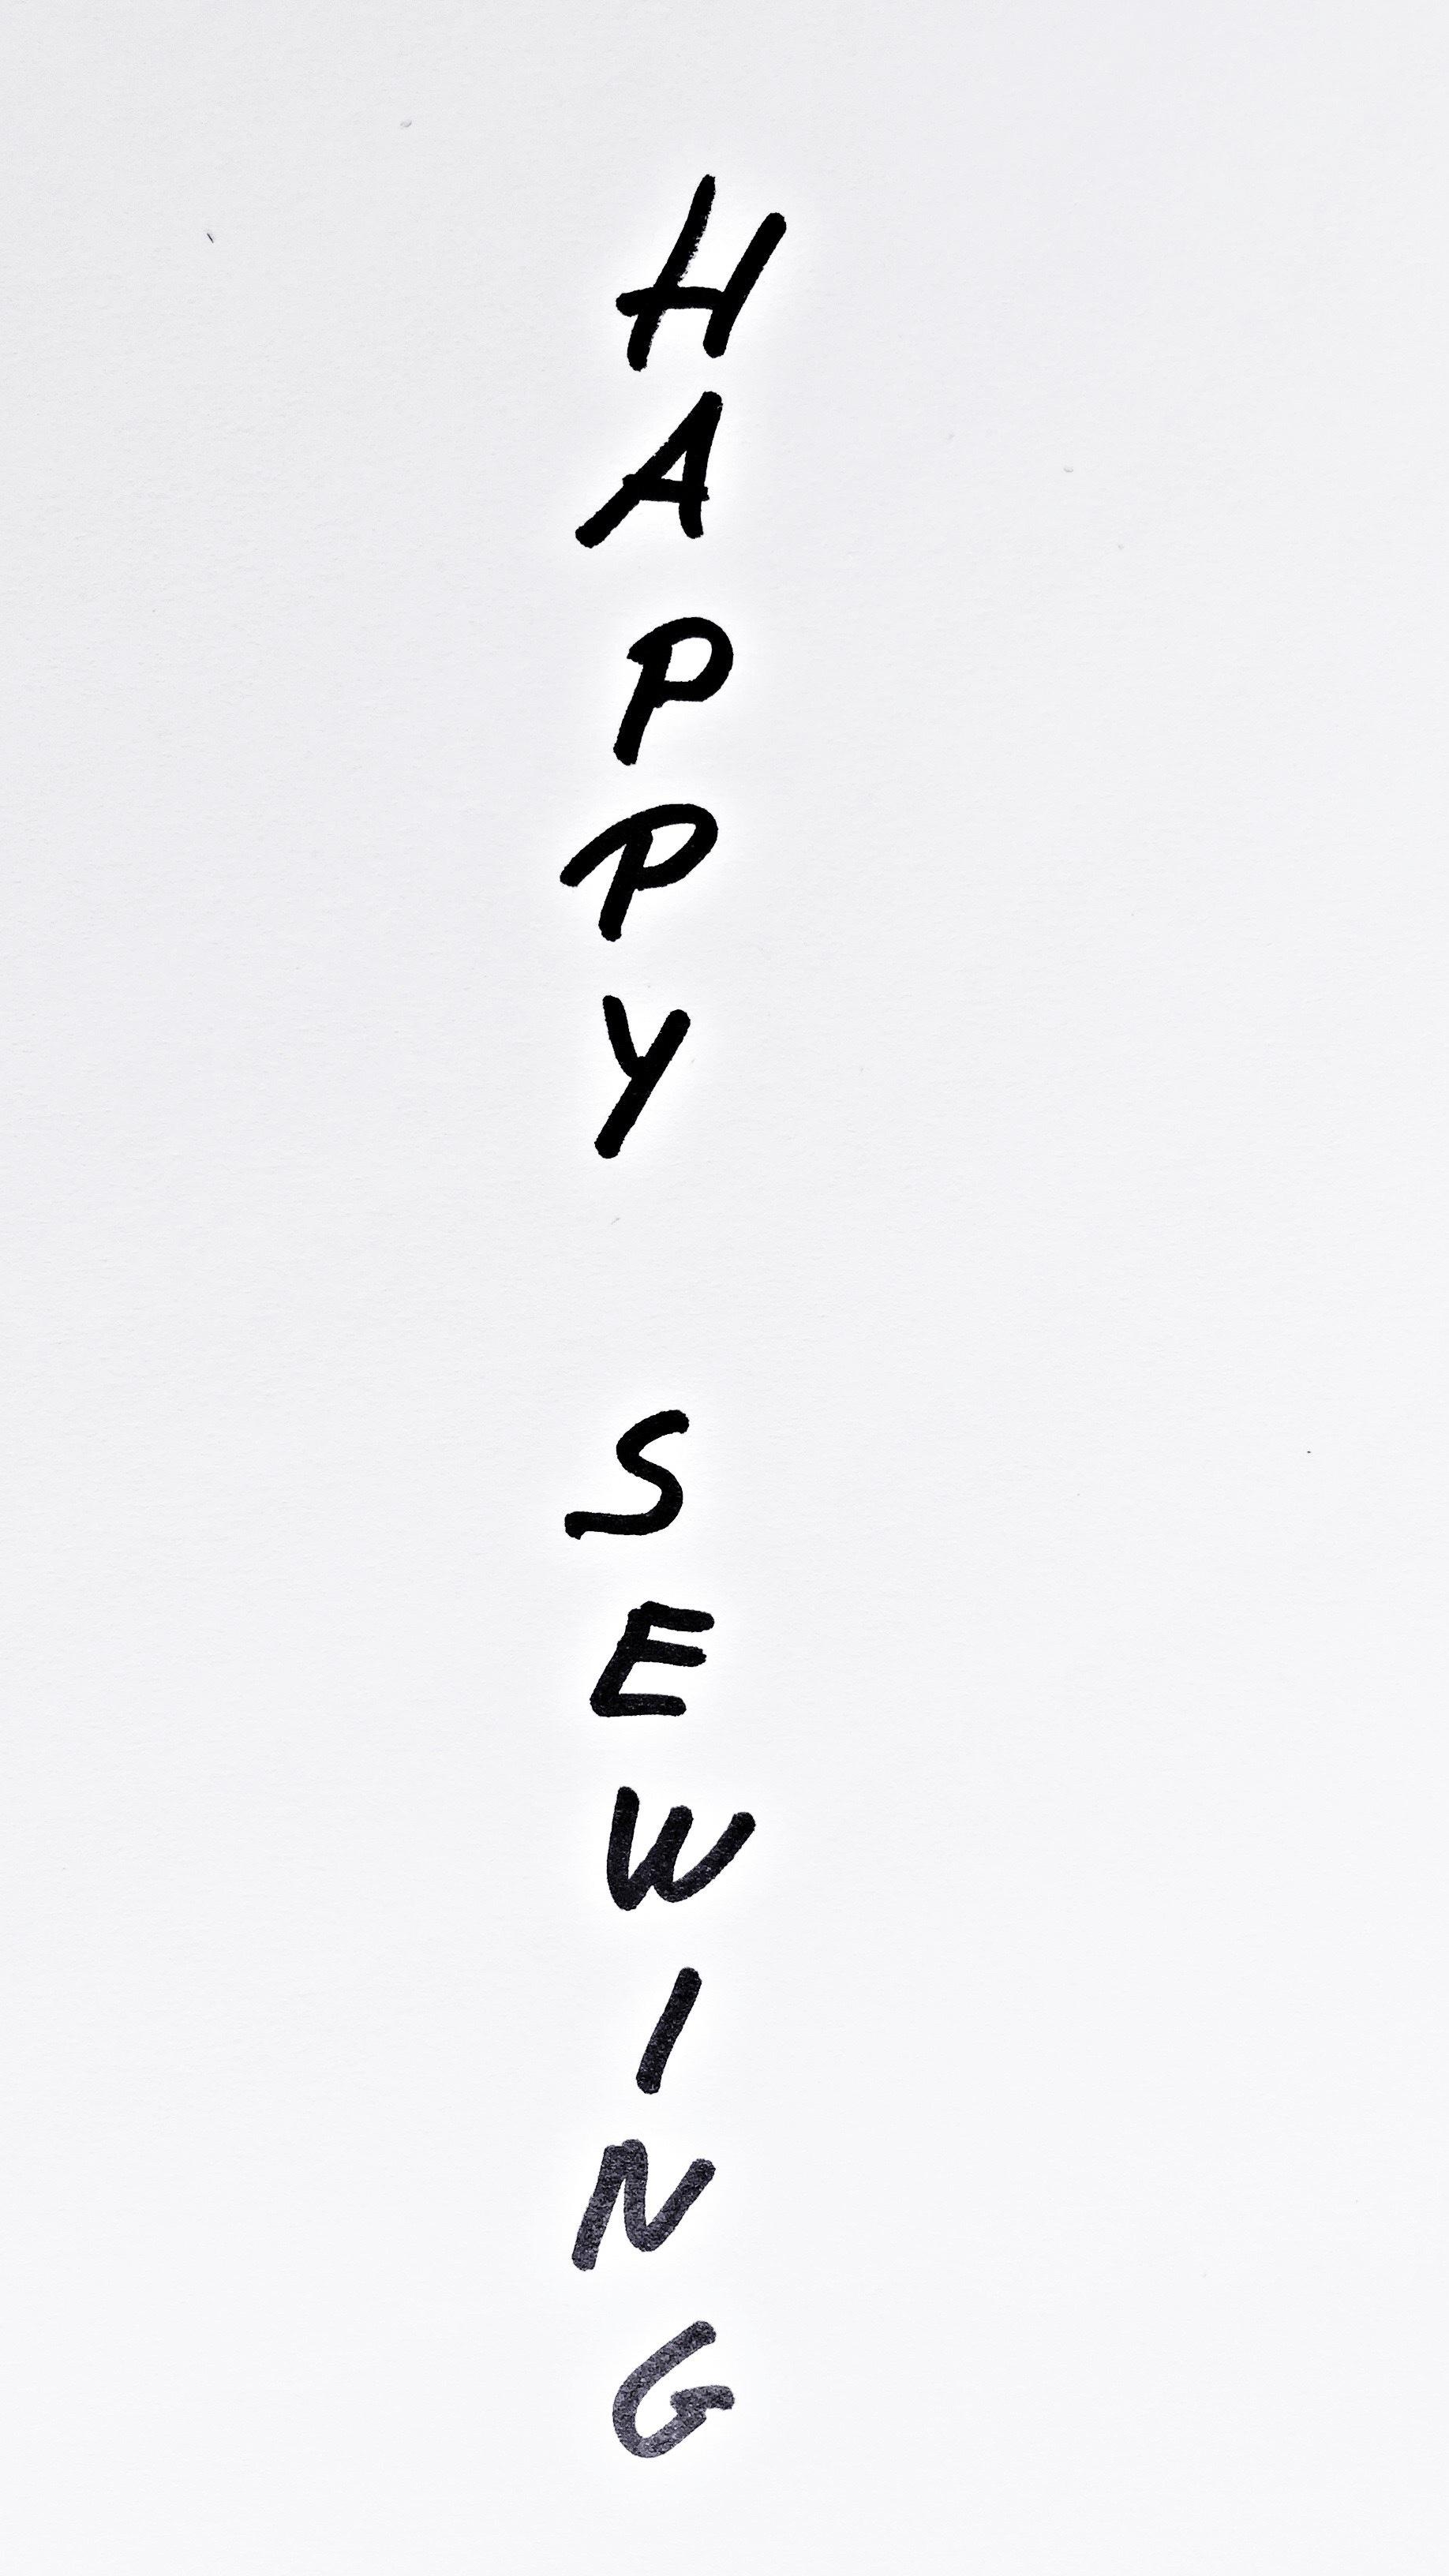 Image 9.jpg